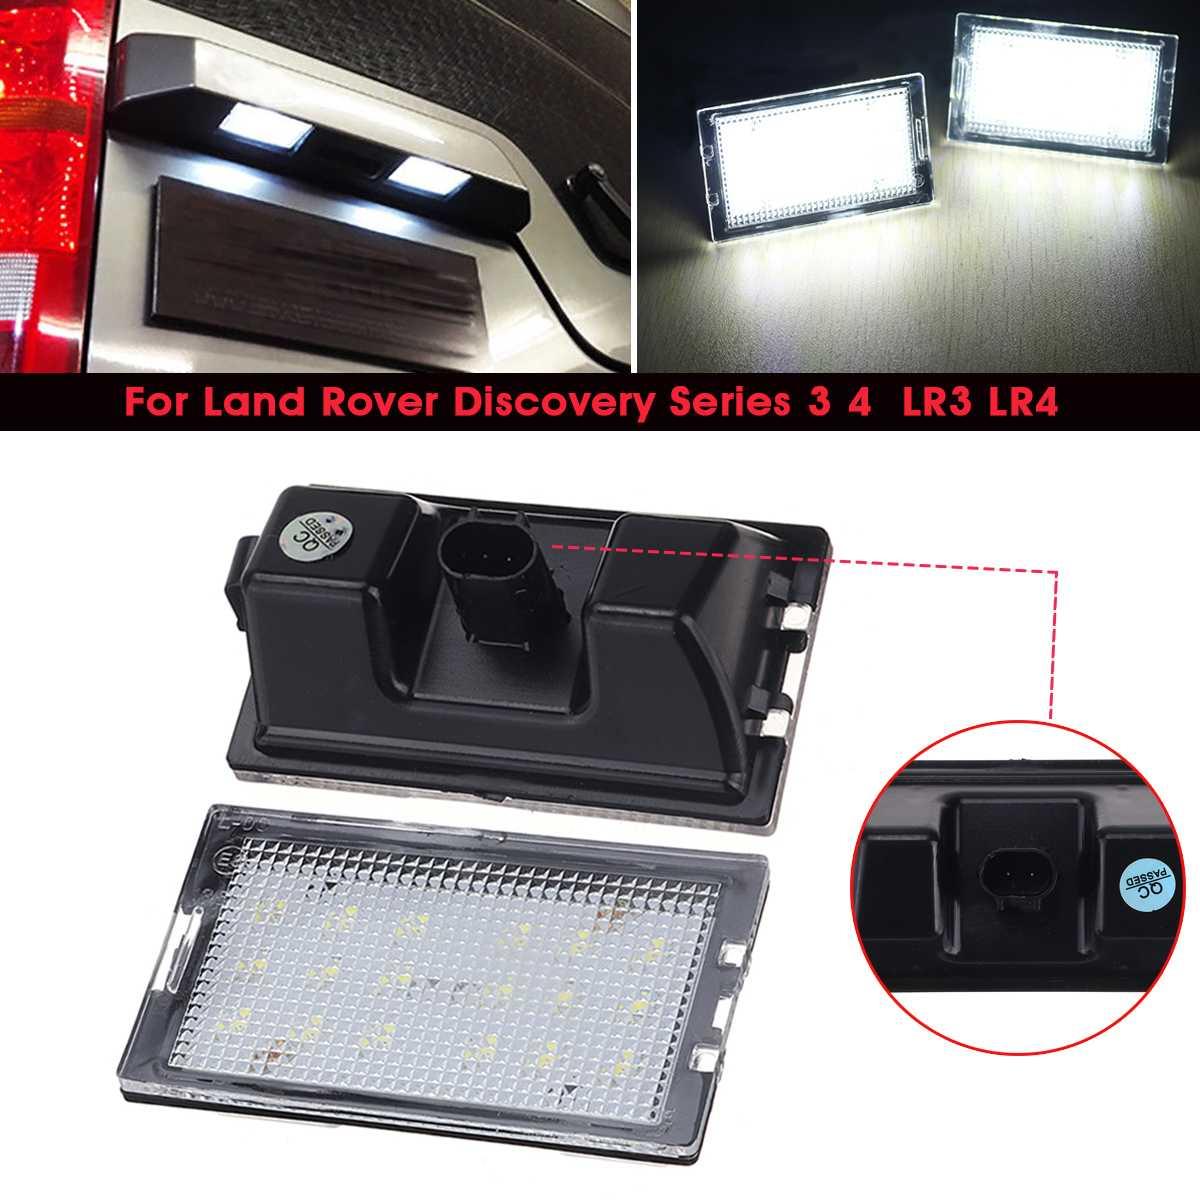 2x 12V Error Free LED License Plate light Lamp For Land Rover Discovery LR3 LR4